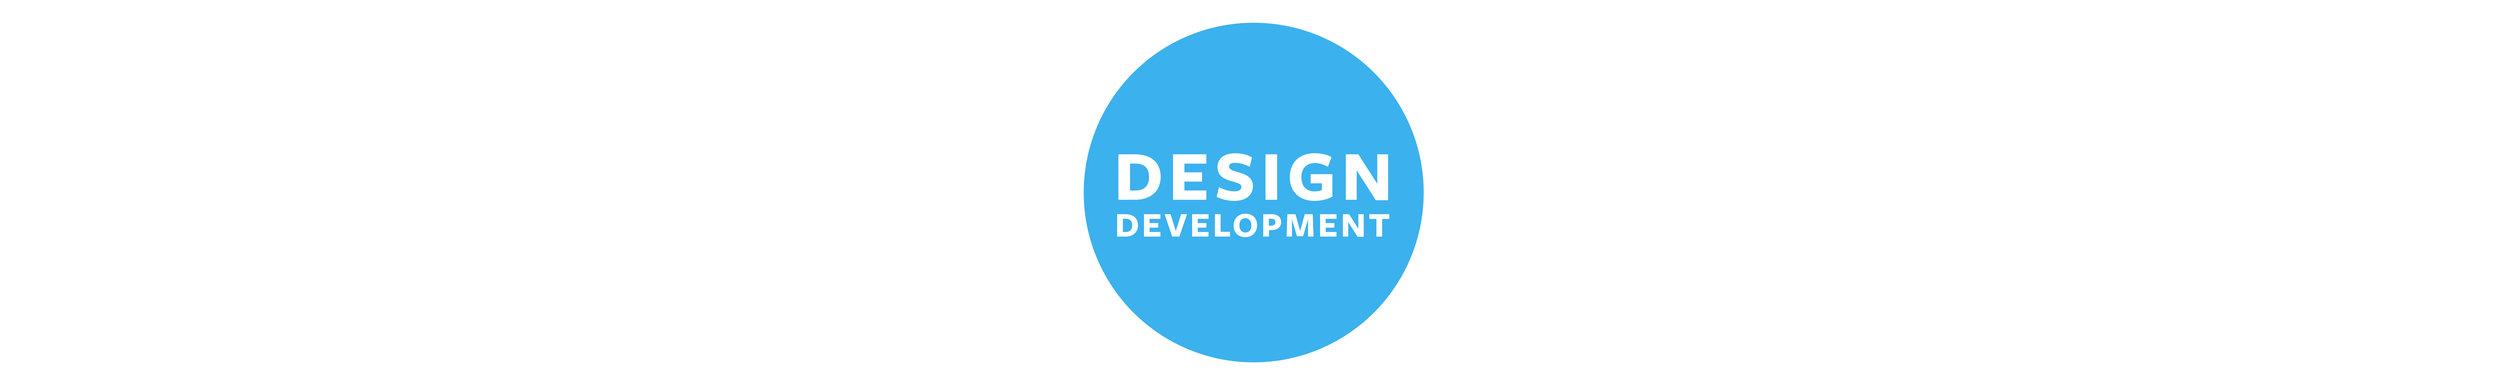 DESIGN DEVELOPMENT.jpg